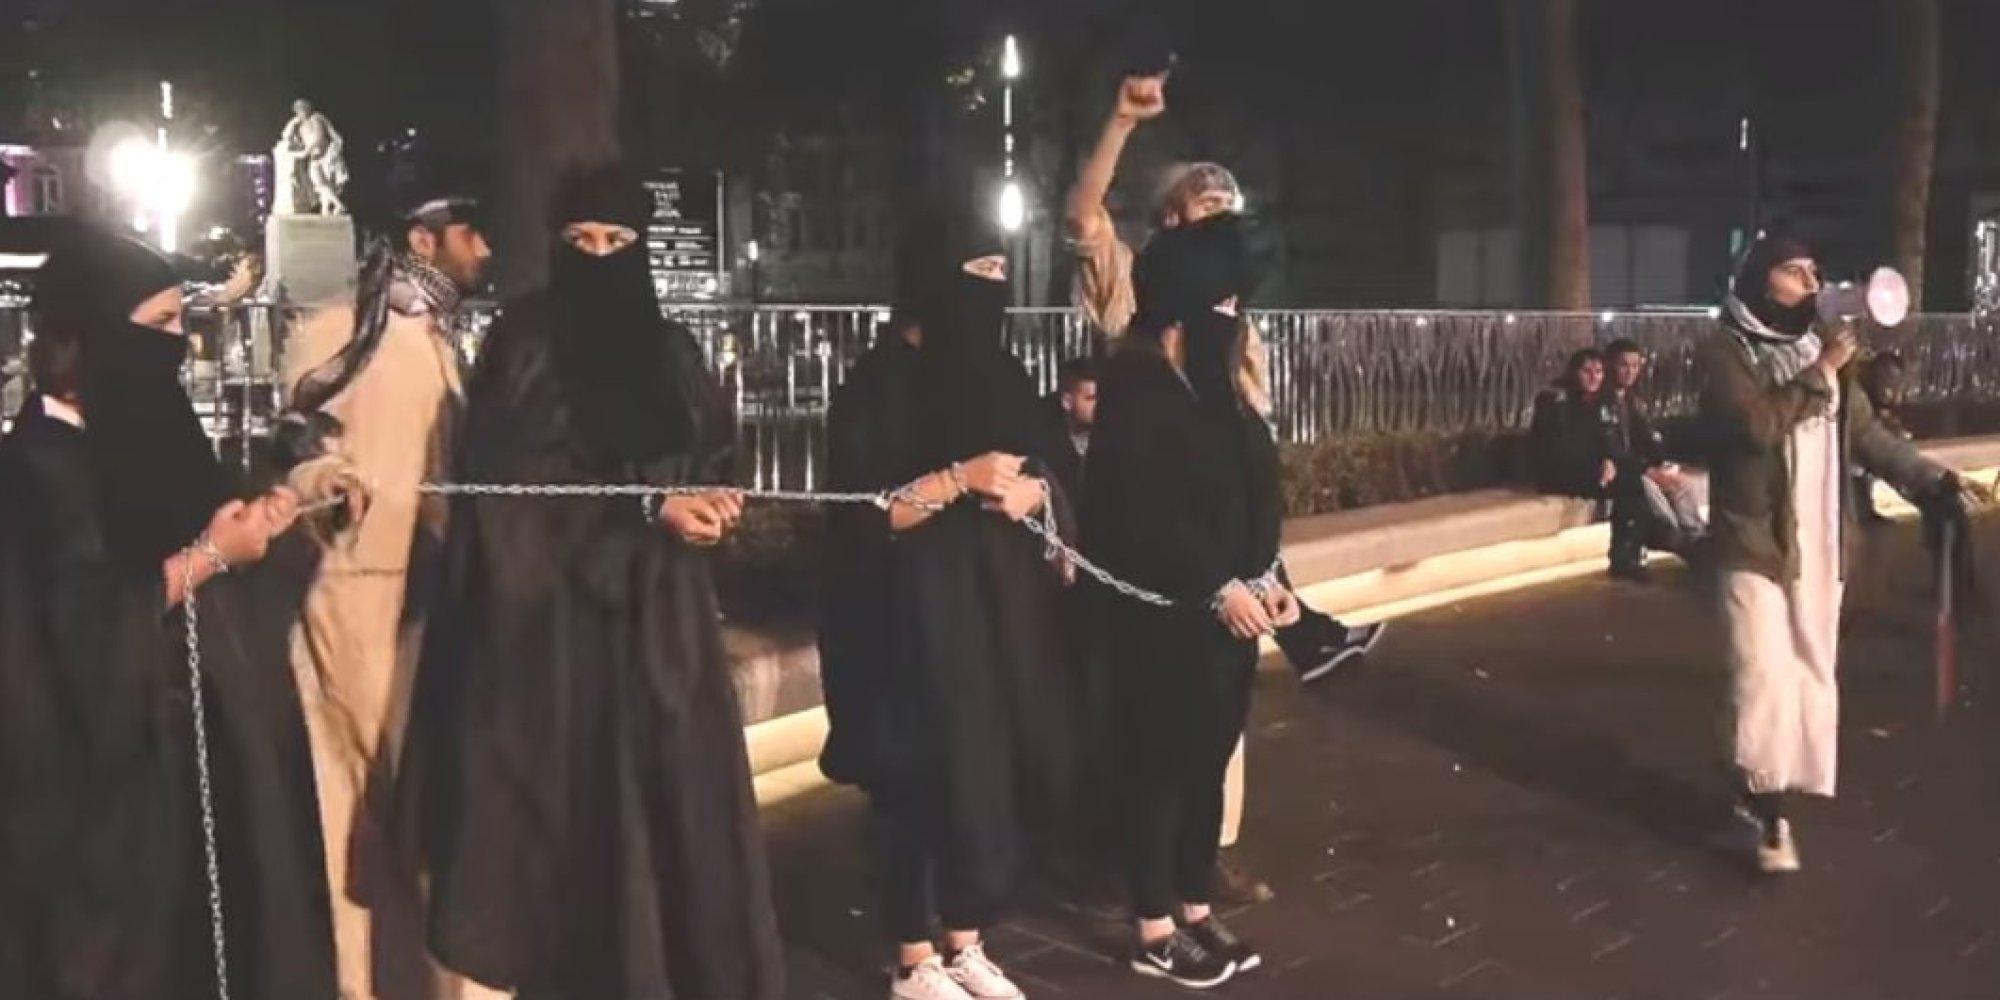 Slavernij vrouwen